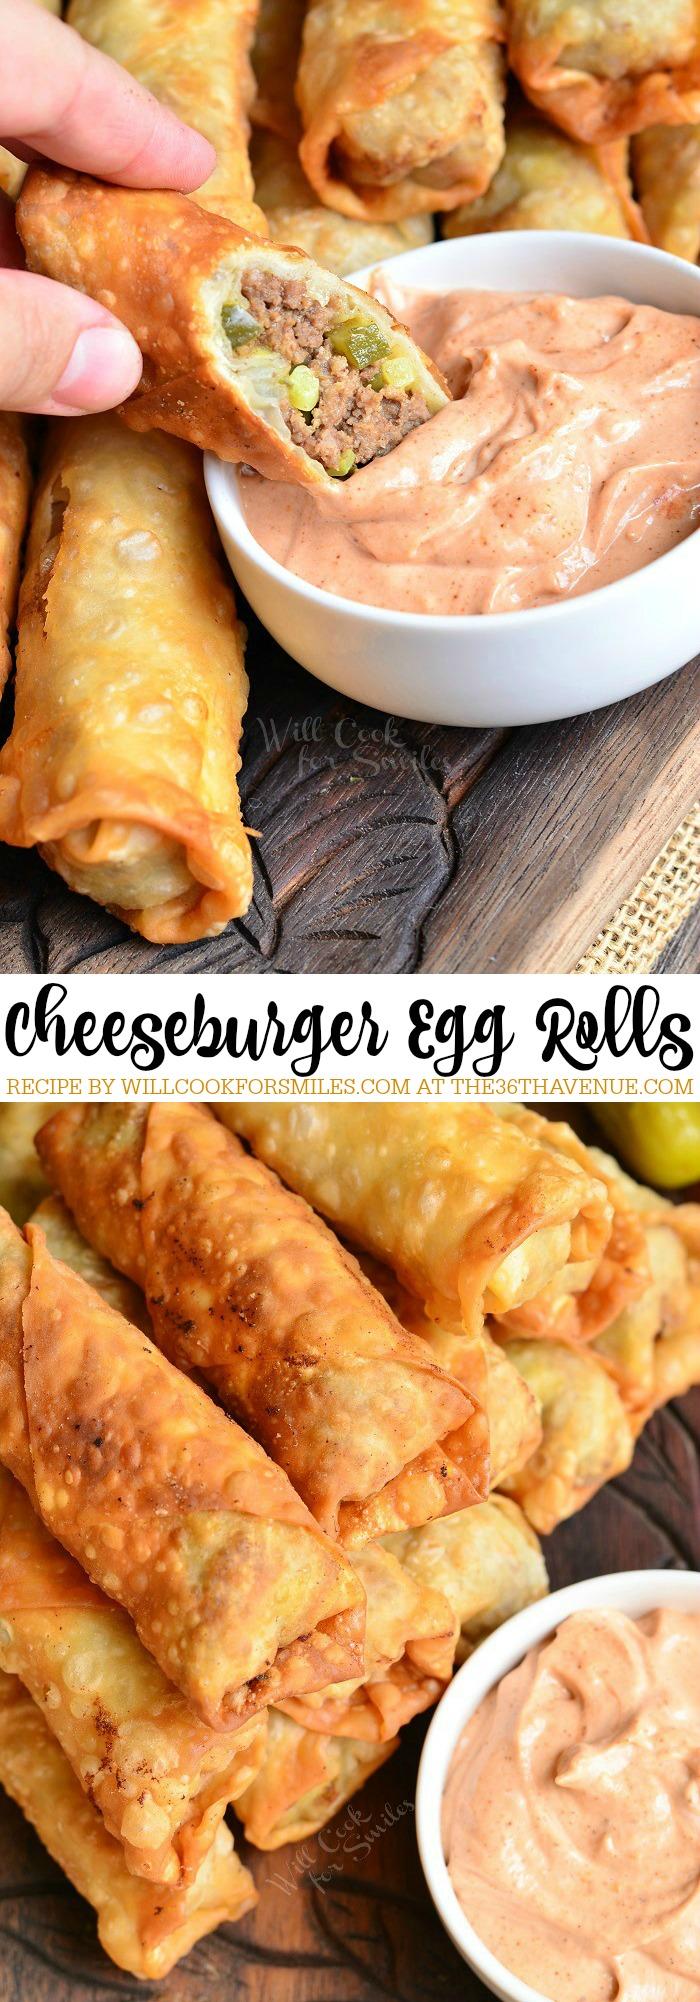 cheeseburger egg rolls the